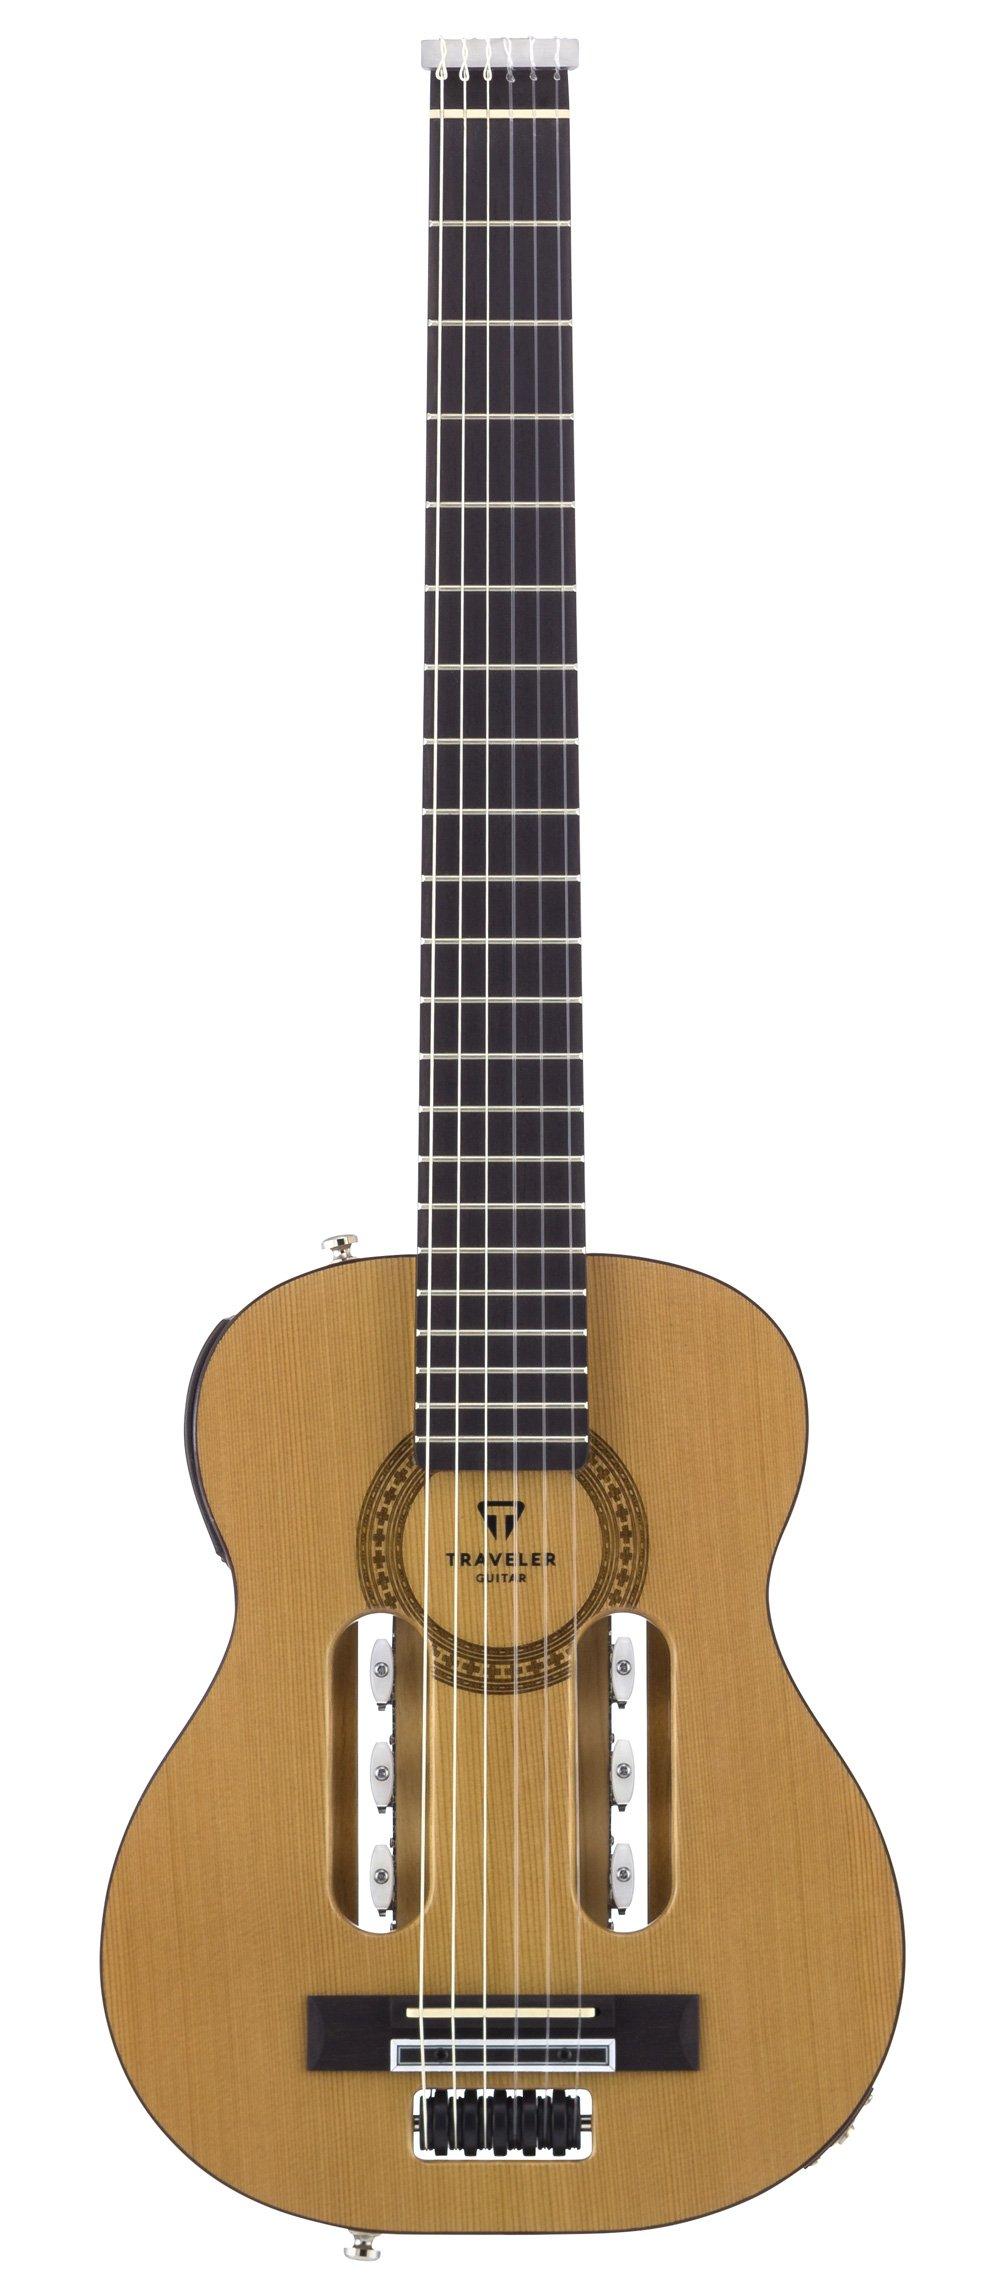 Traveler Guitar ESCN GLS Escape Classical Nylon-String Acoustic/Electric Travel Guitar with Gig Bag, Natural Gloss